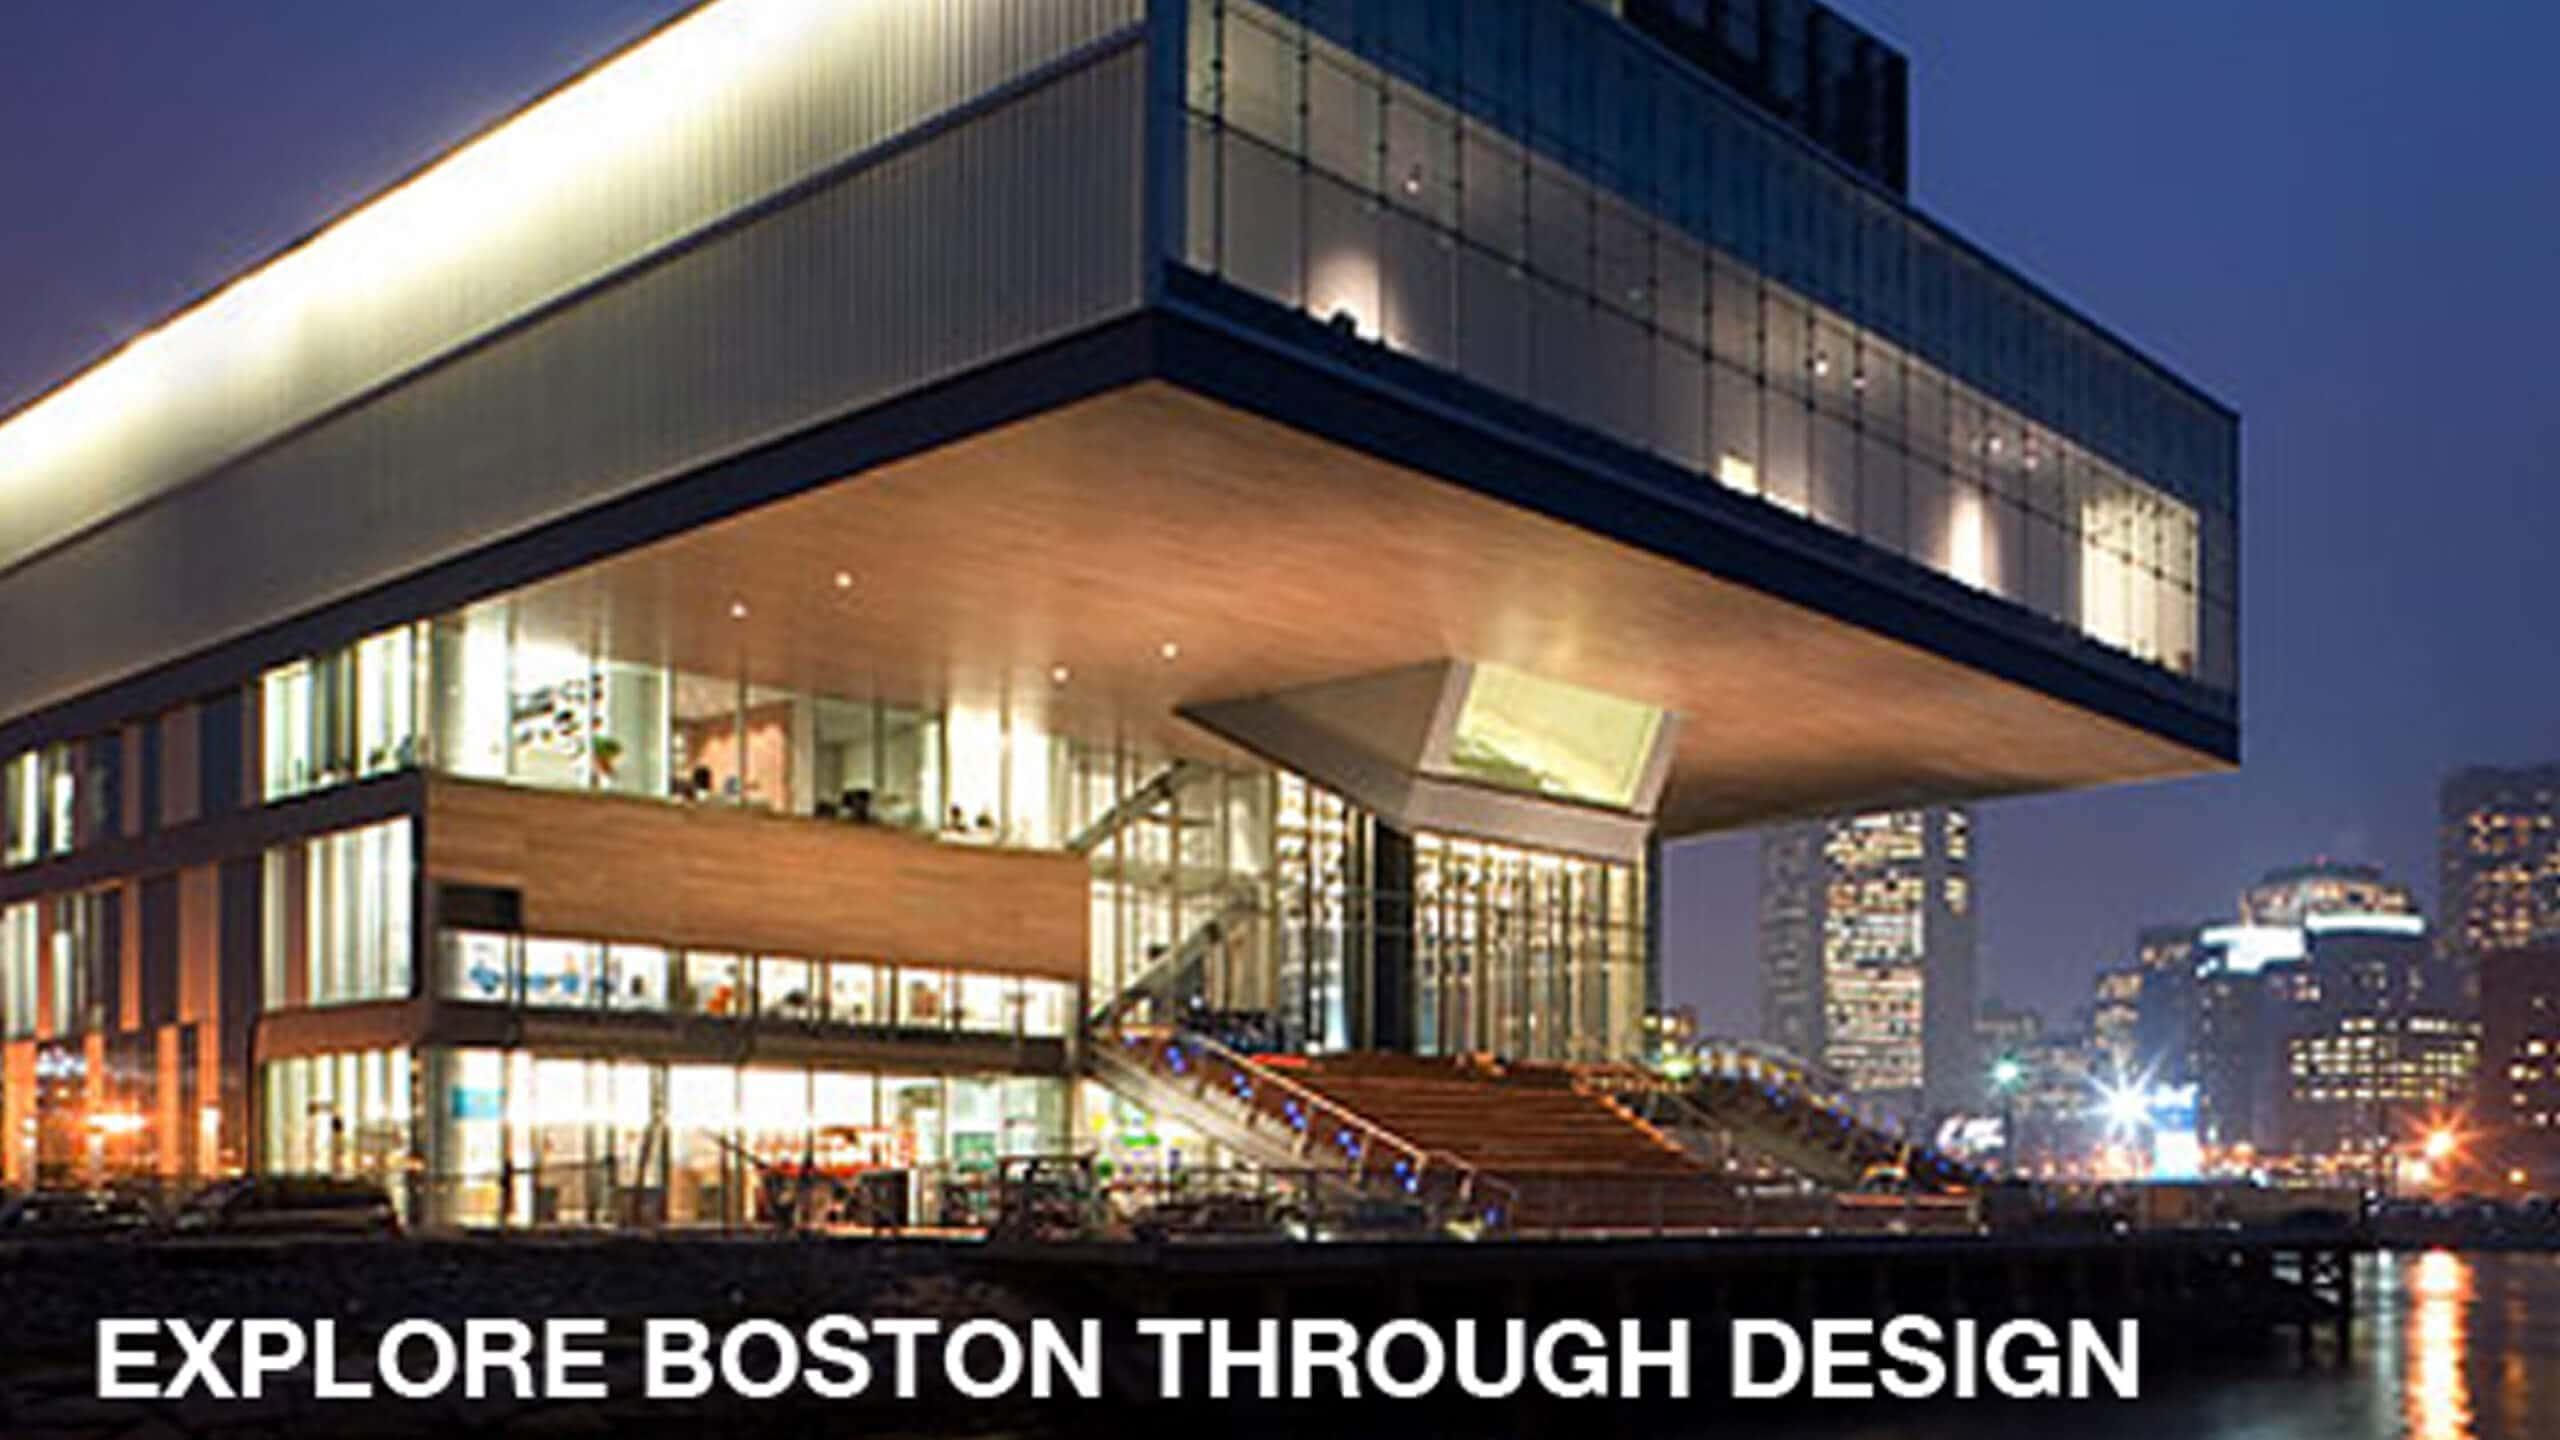 DESIGN IN BOSTON